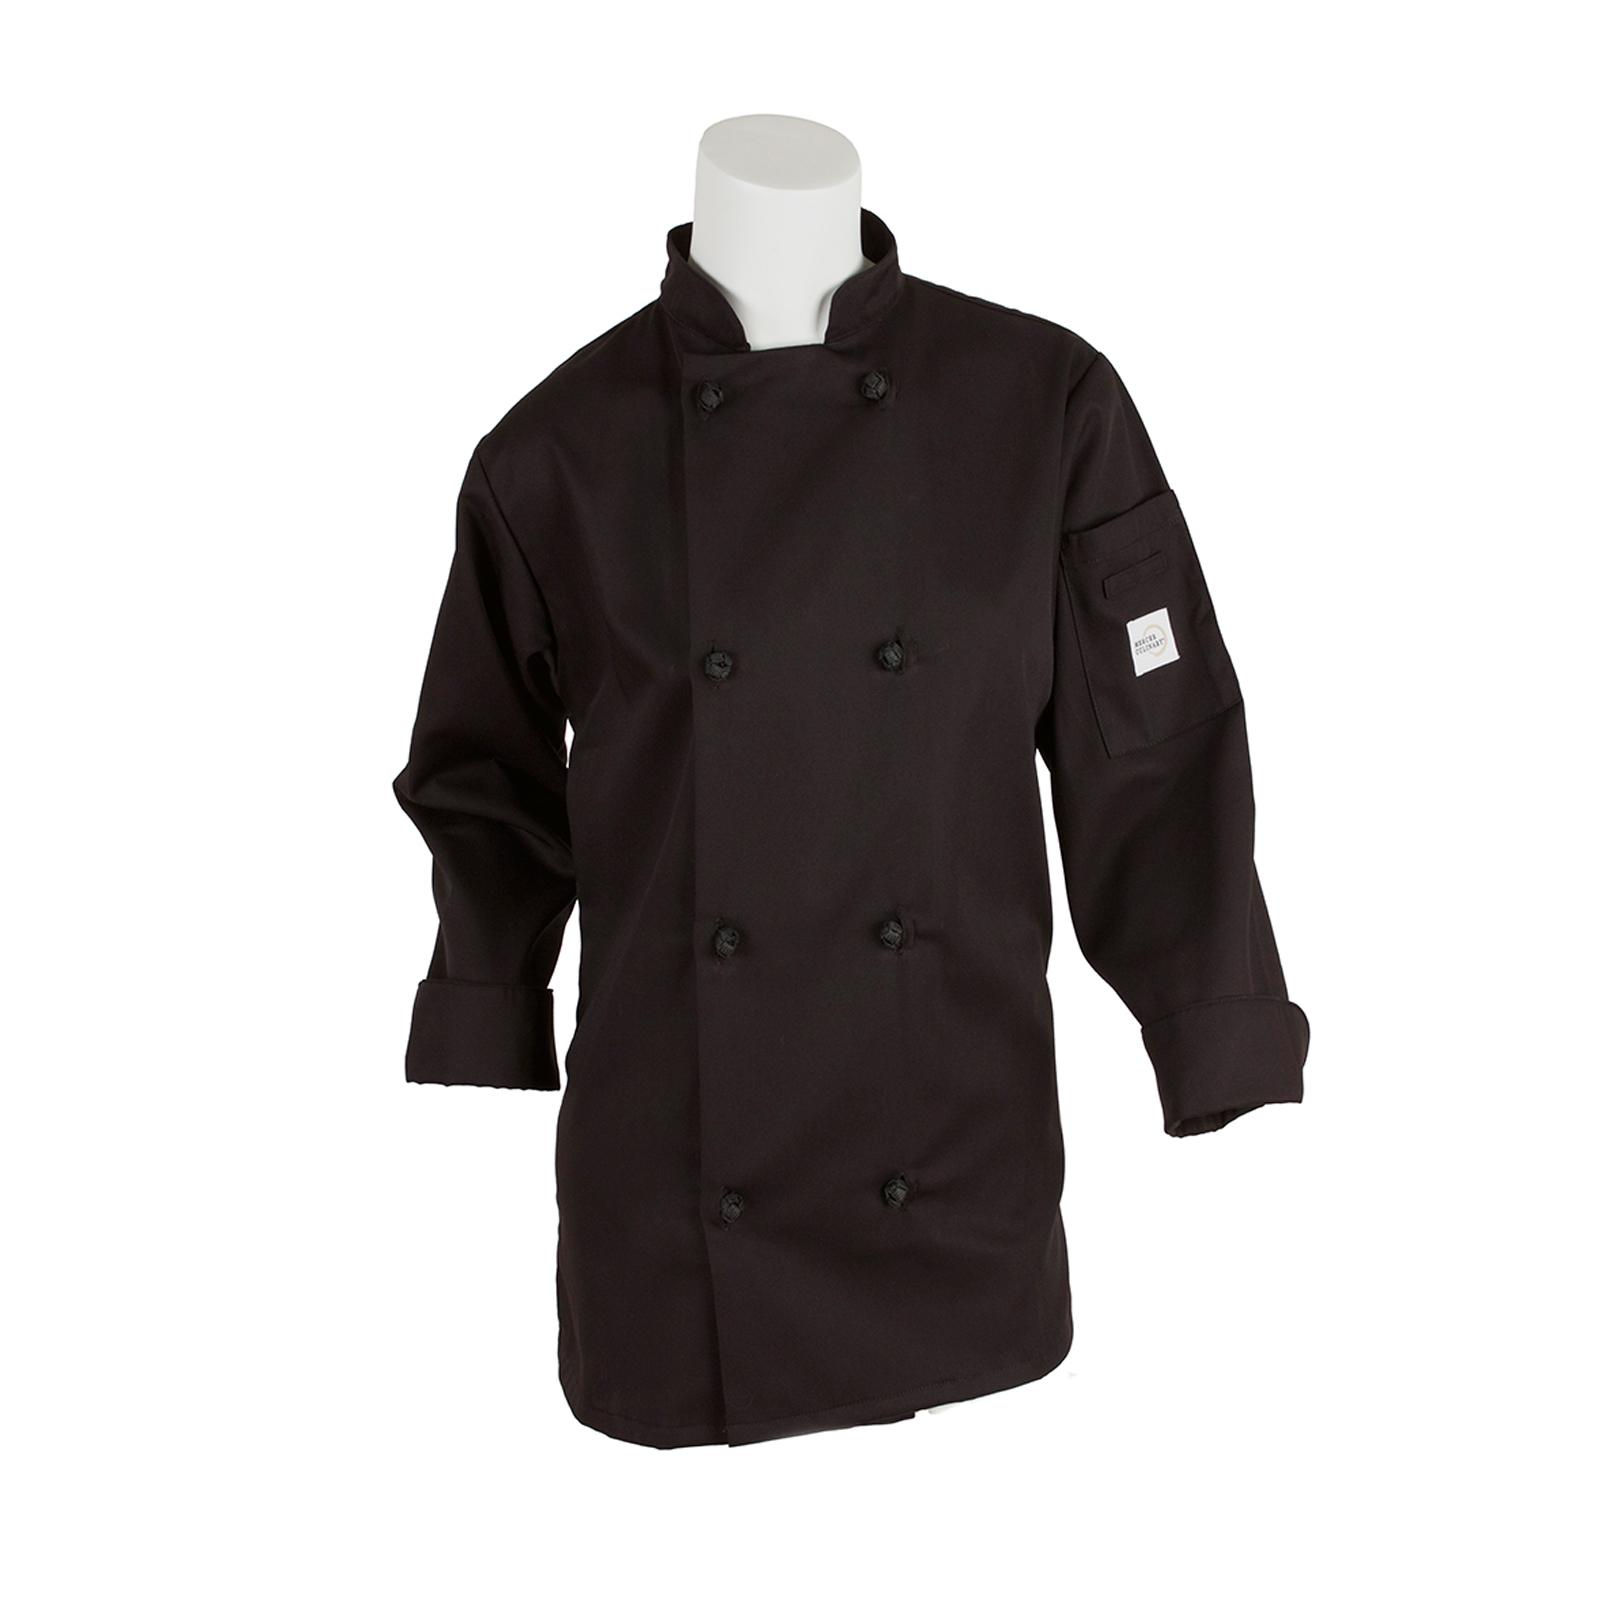 Mercer Culinary M60022BKM chef's coat